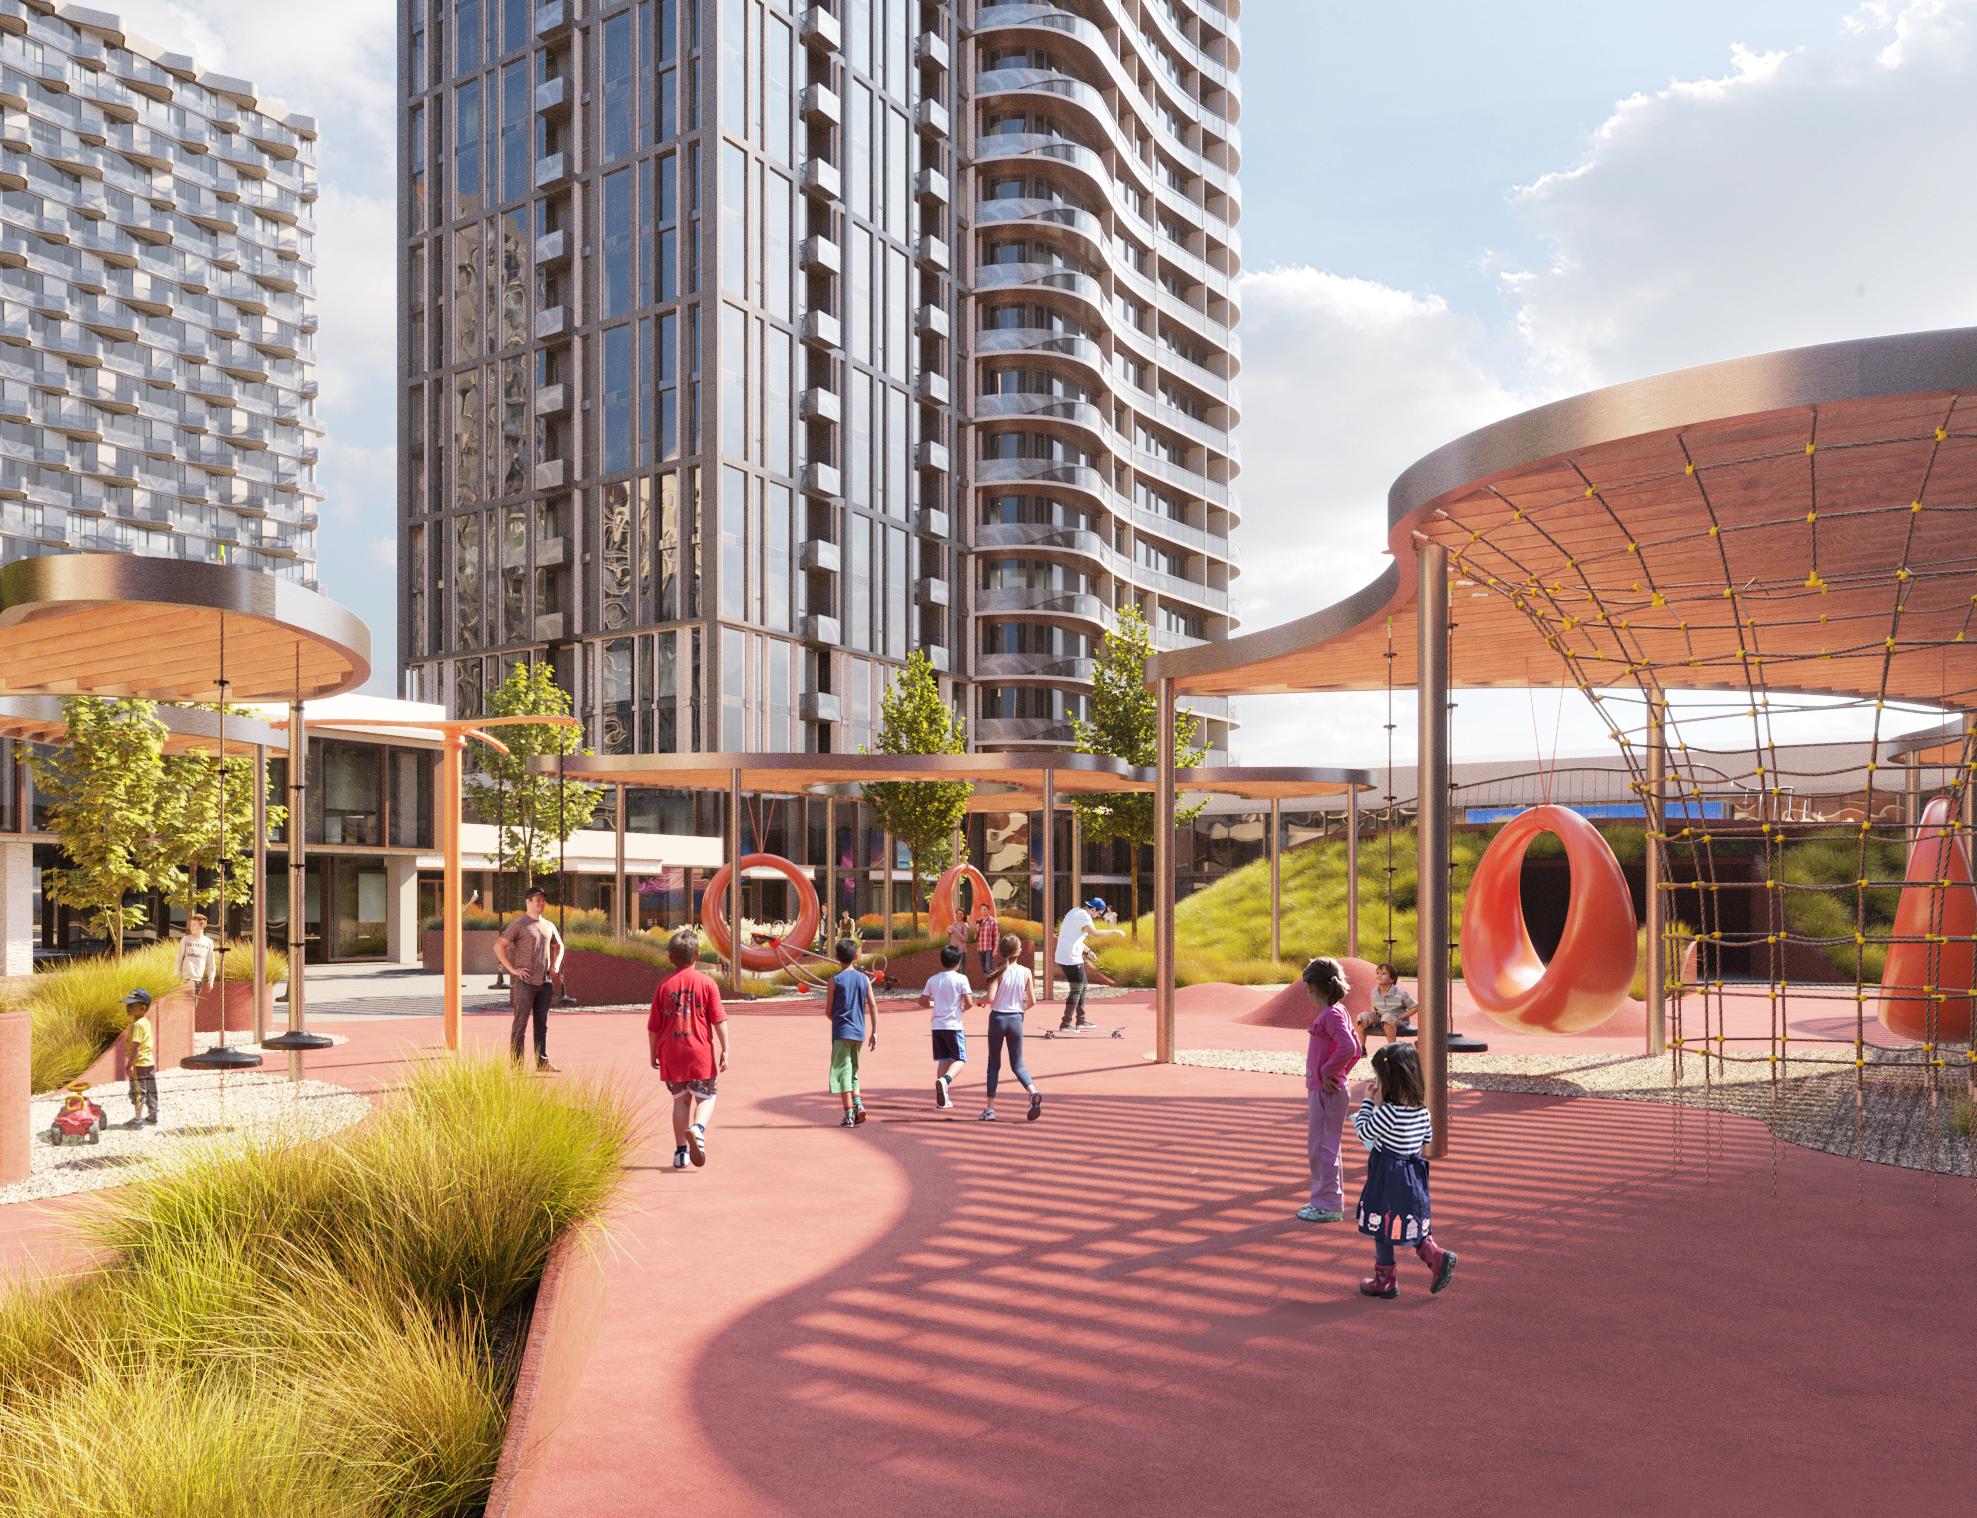 Як виглядатиме житловий комплекс Creator City